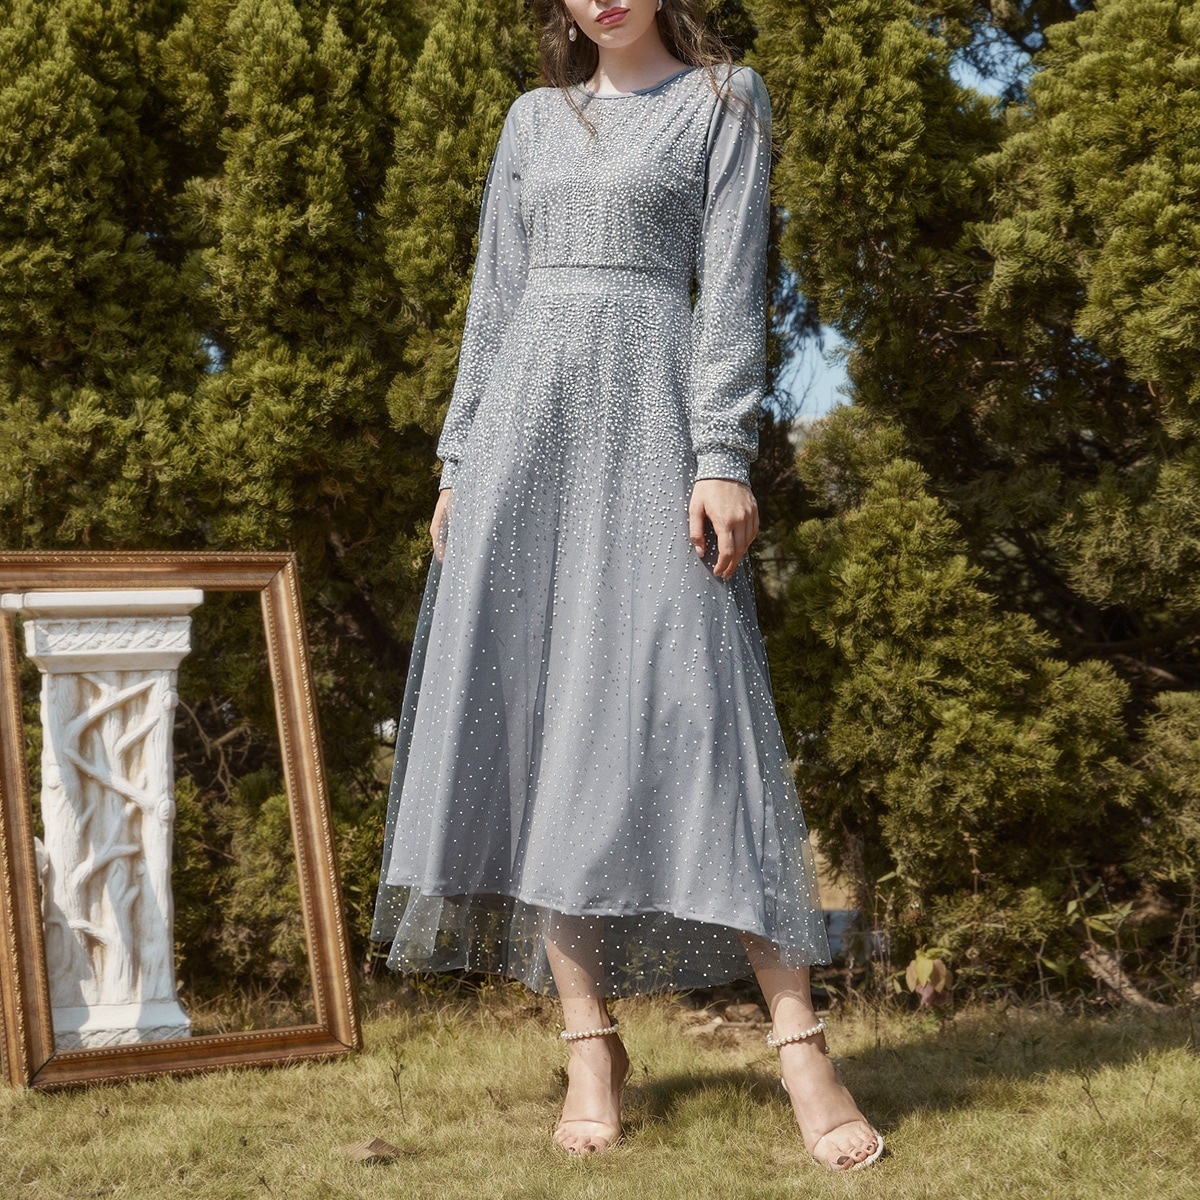 Mesh Overlay Polka Dot A-line Dress